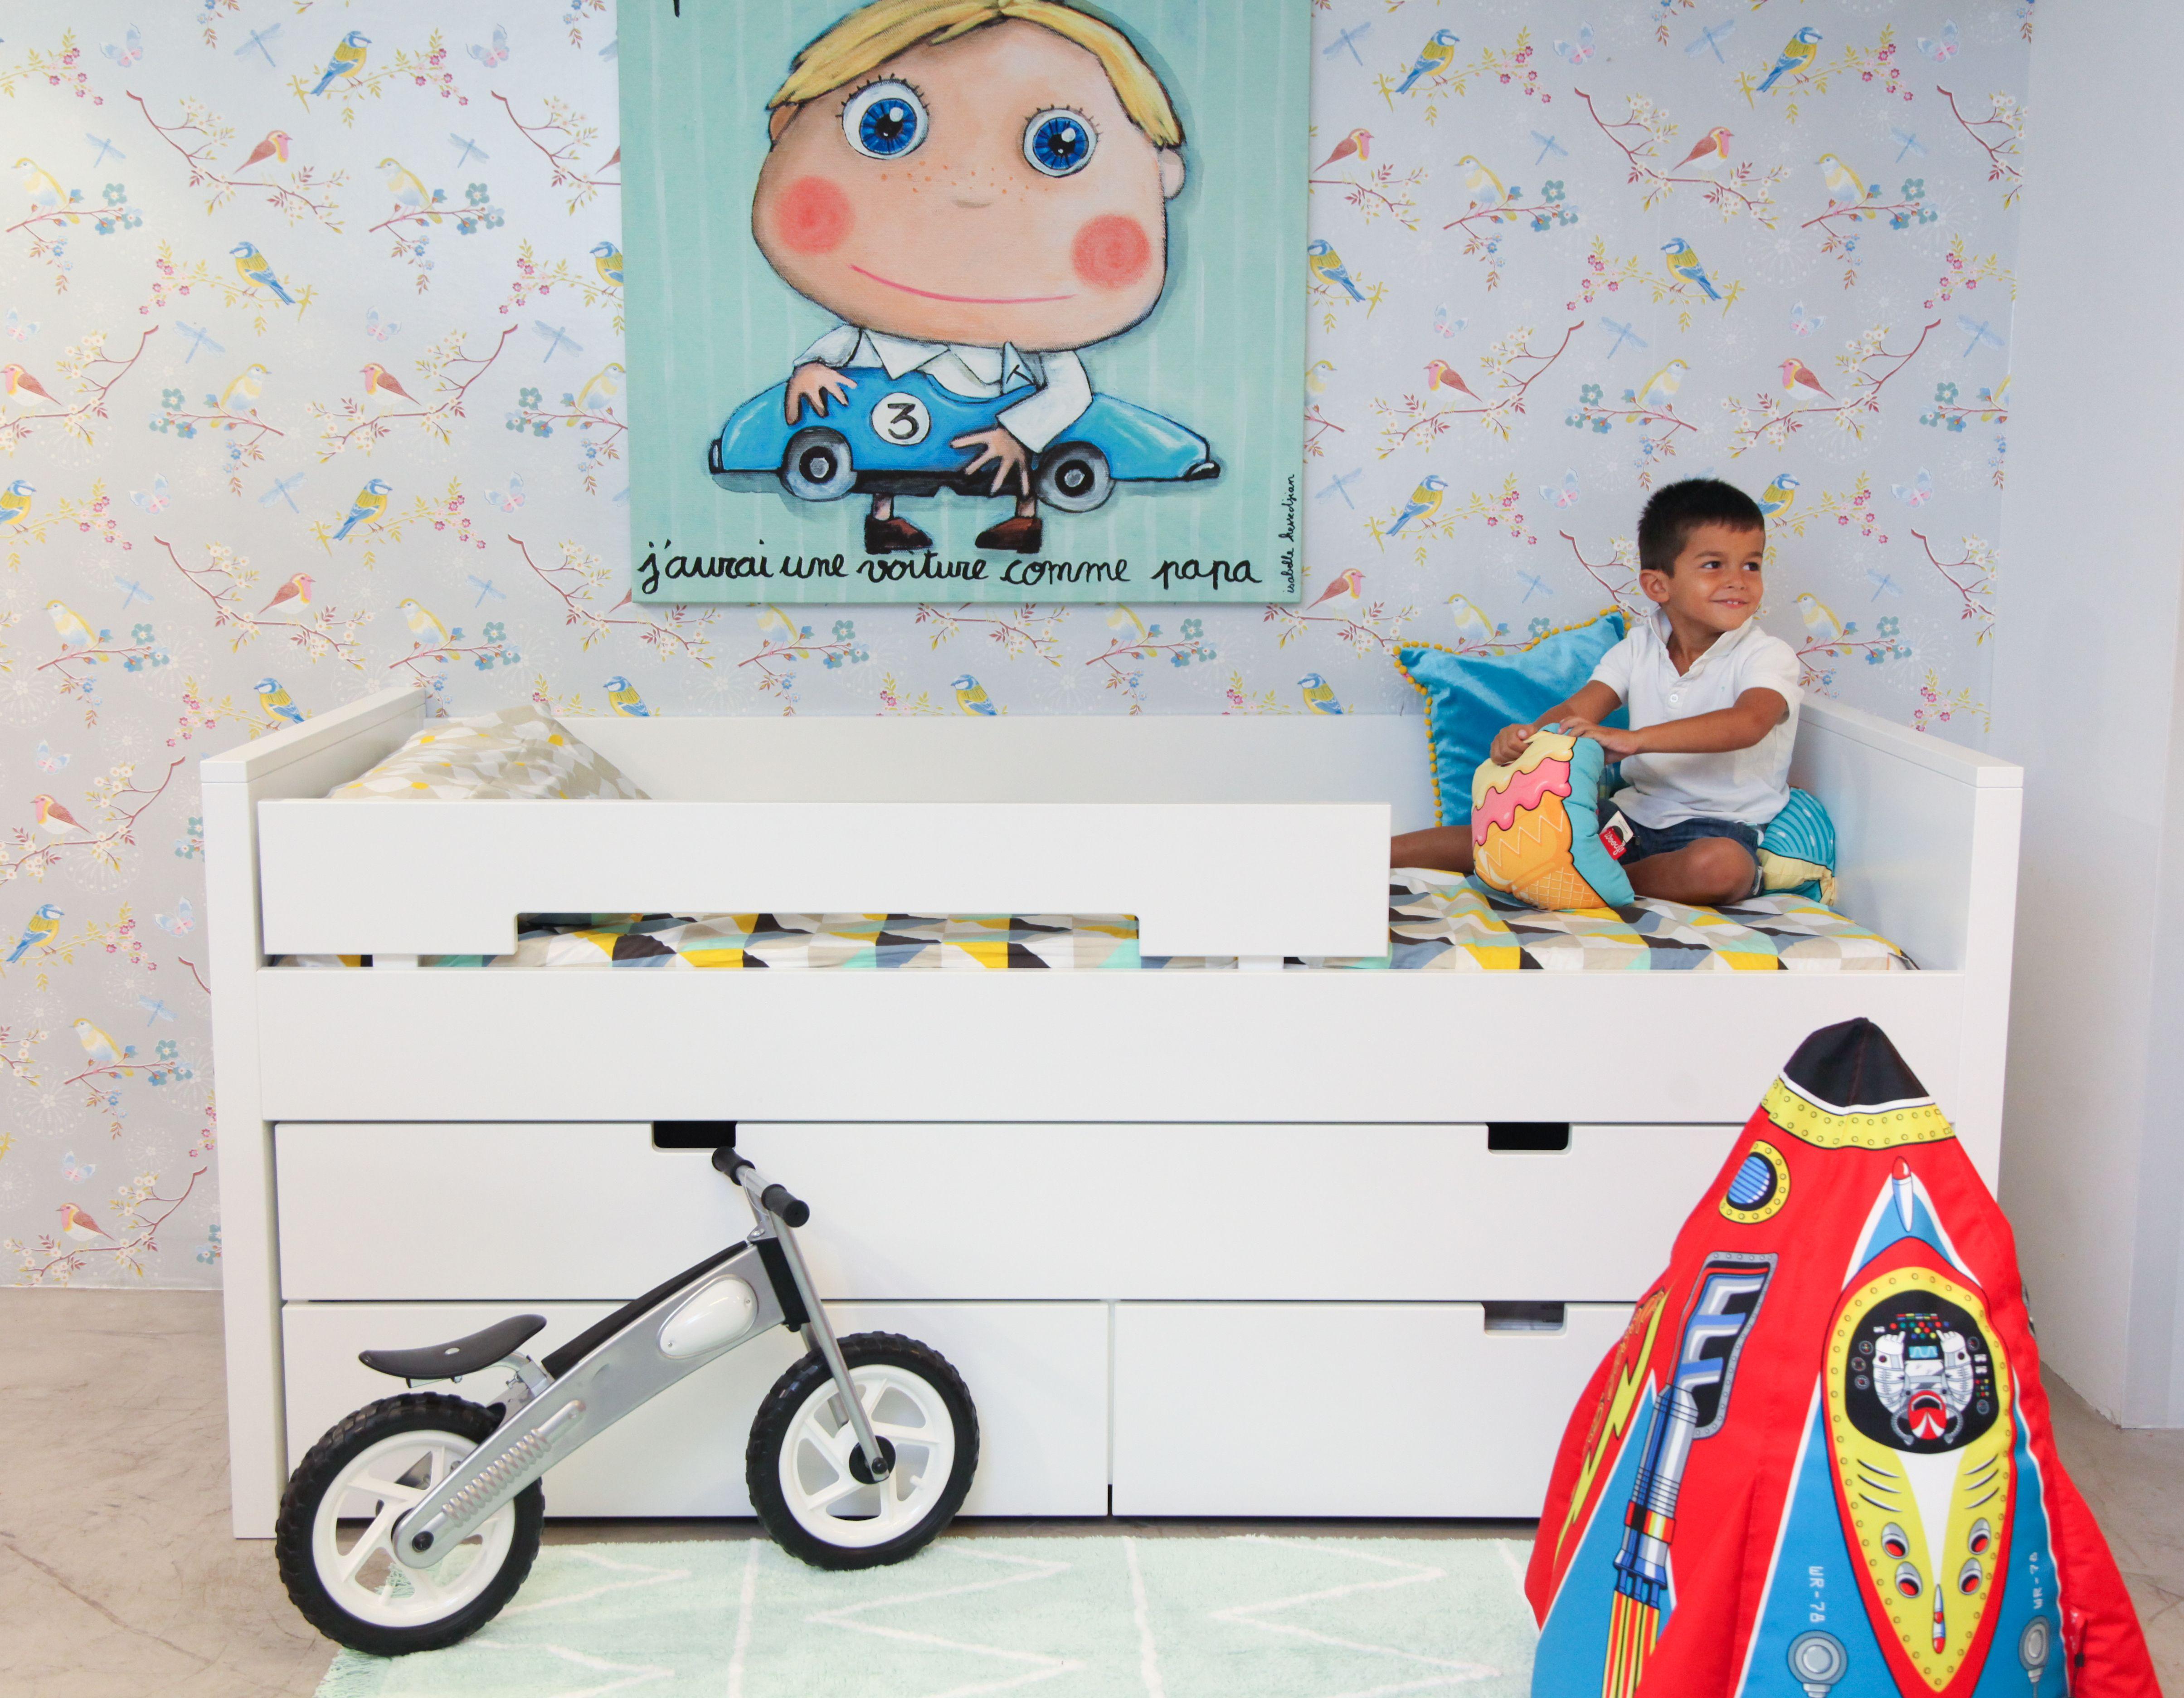 Habitaci n infantil habitaci n de ni o decoraci n - Decoracion habitacion nino ...